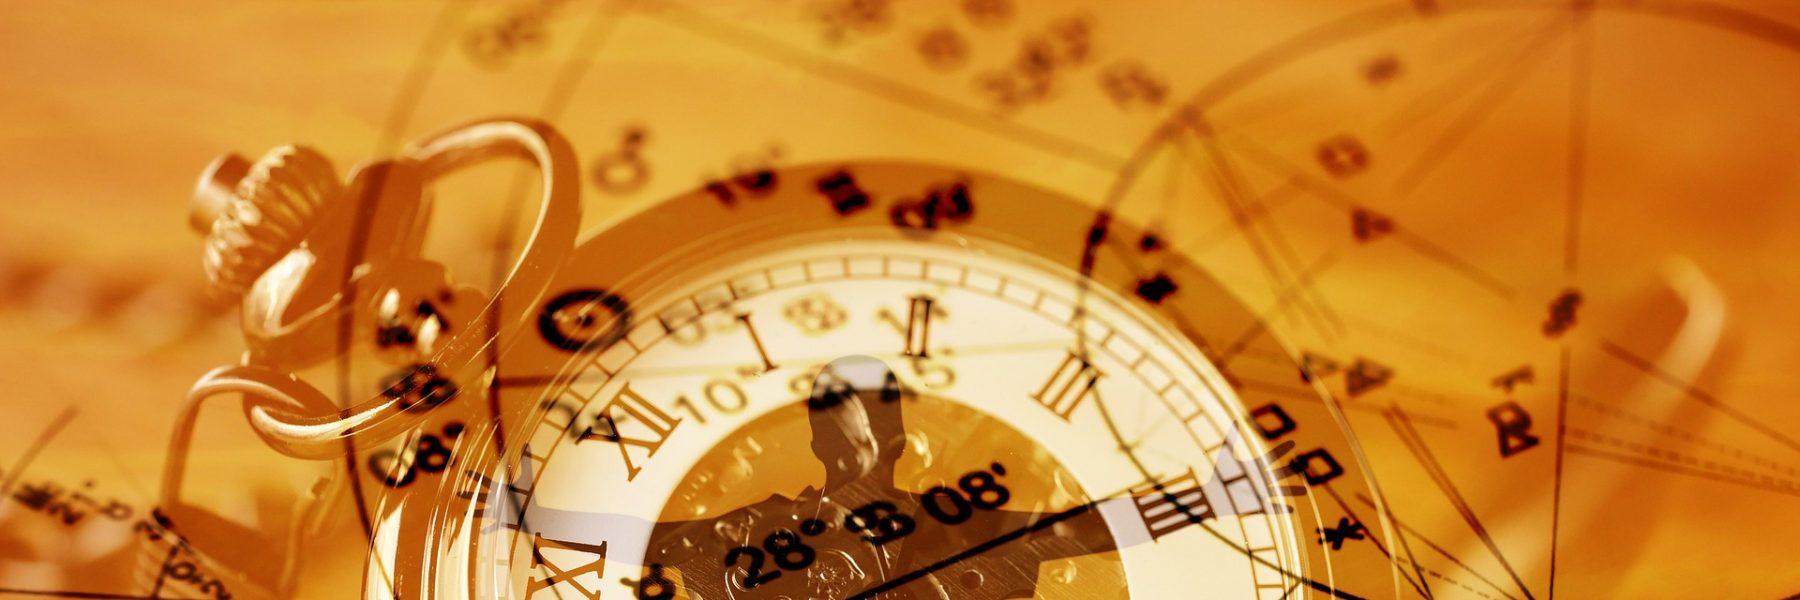 horloge astrologie Scorpion